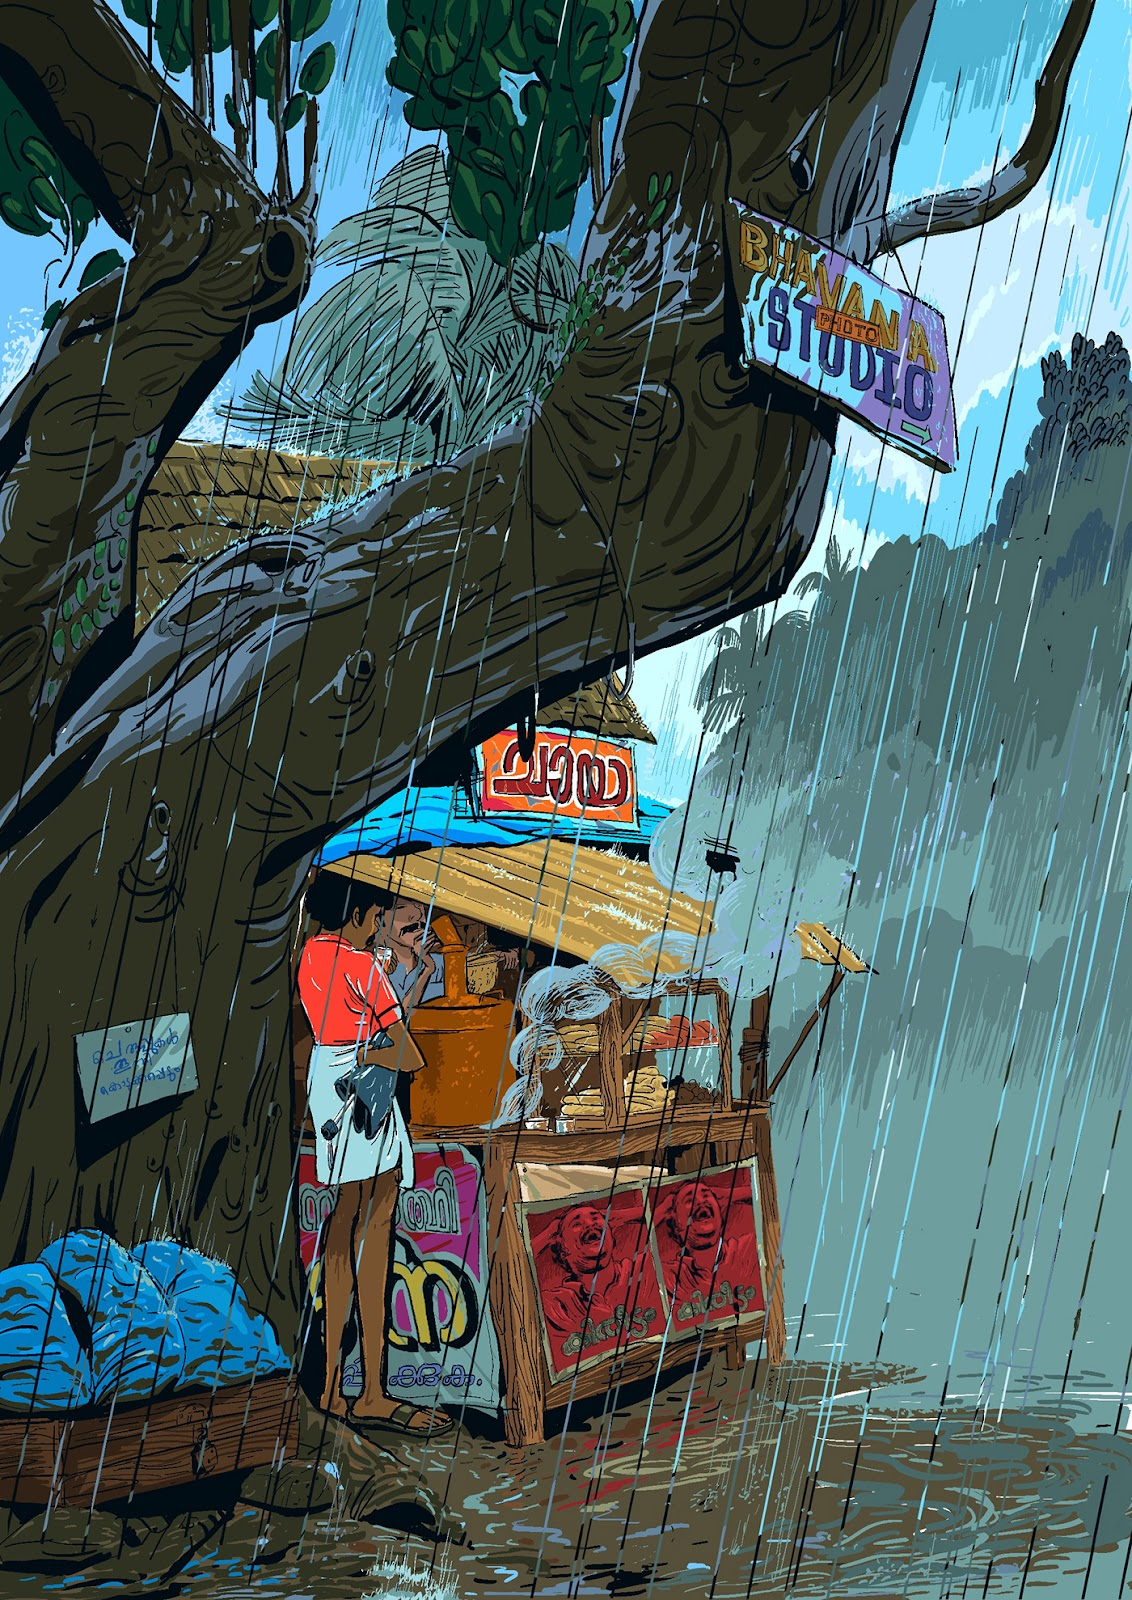 Rain and Life Illustrations by Vipin Das